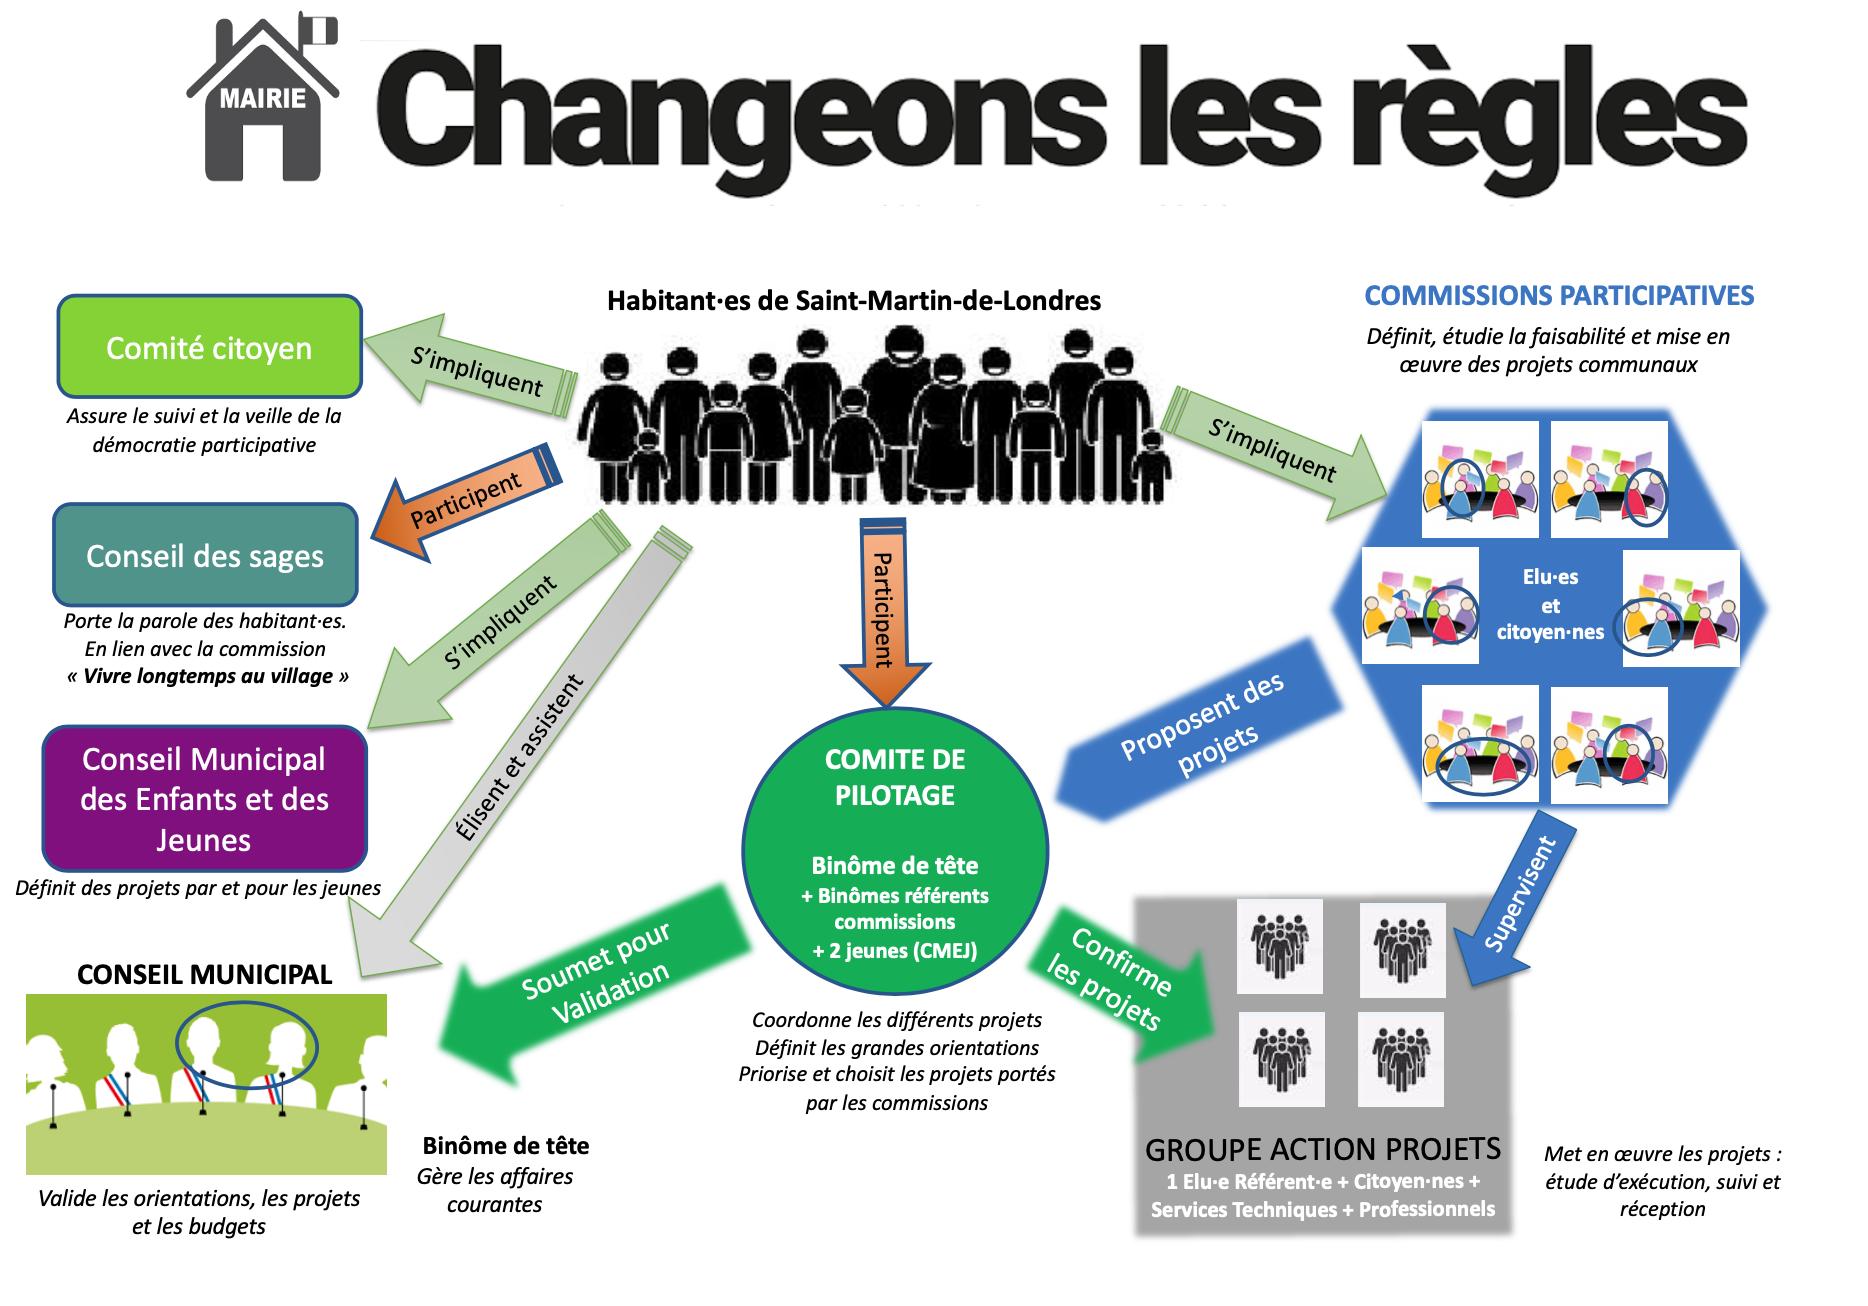 image mairiechangeonslesregles.png (0.9MB)